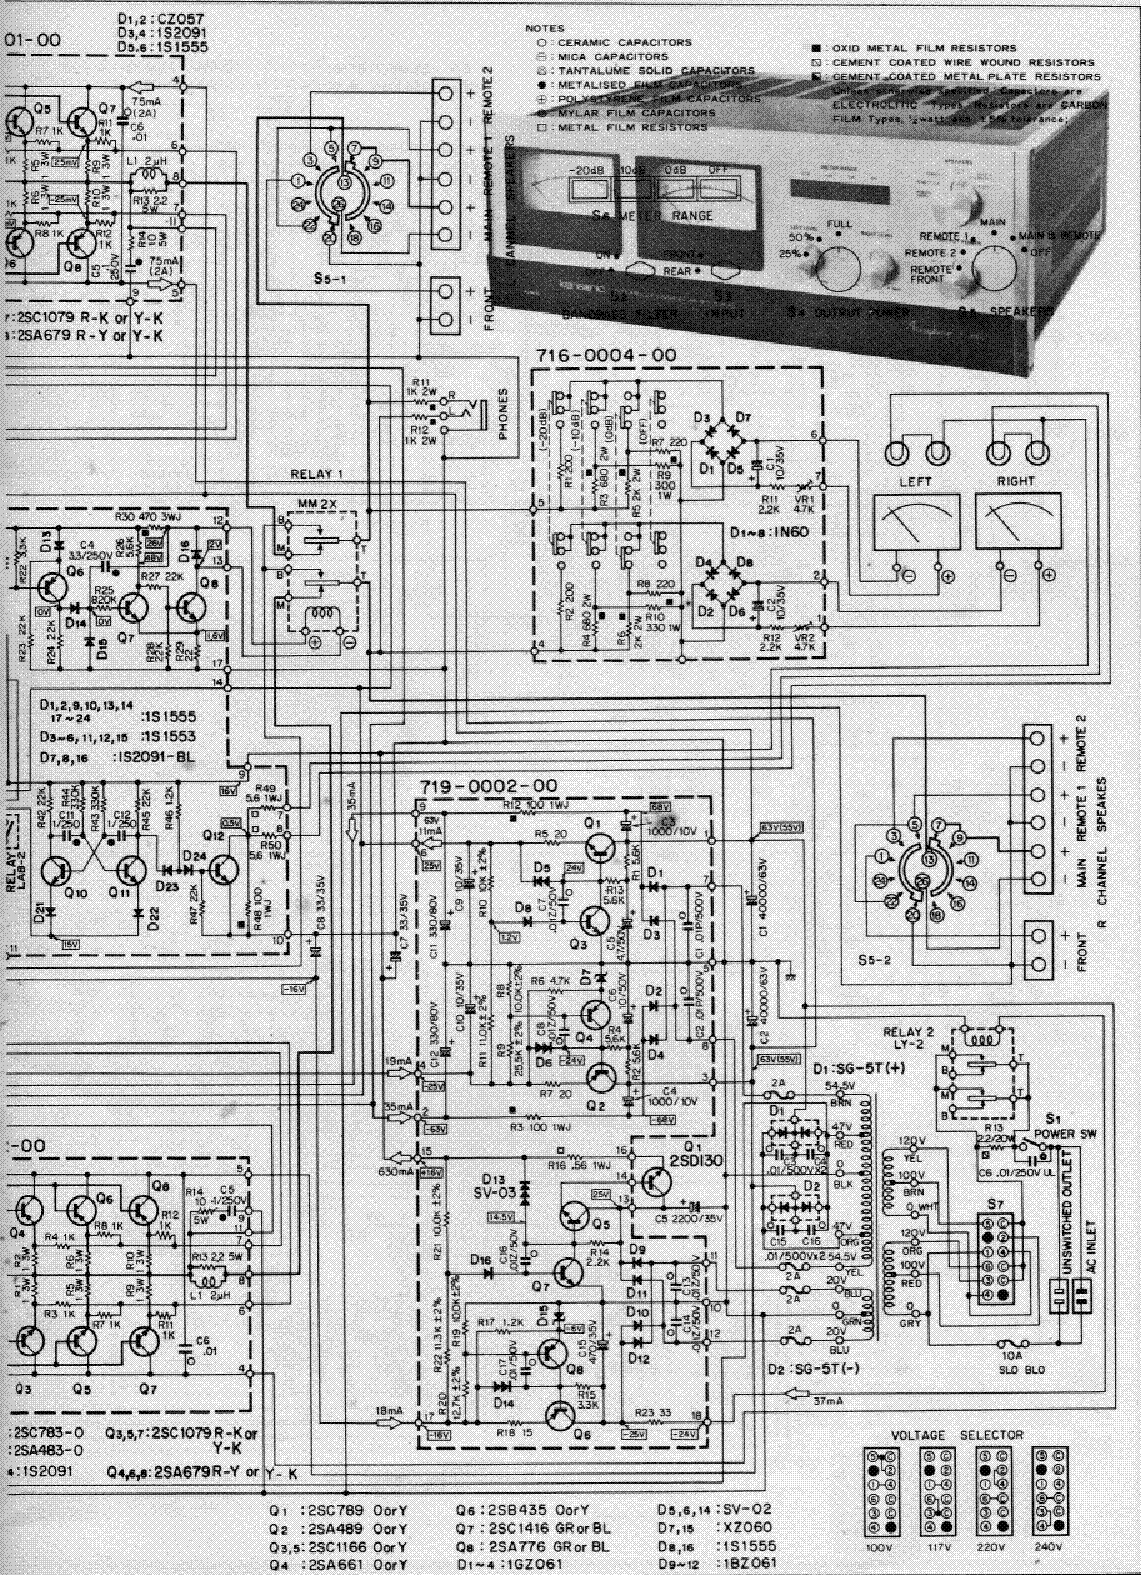 GUERRA CIVIL JAPONESA DEL AUDIO (70,s 80,s) - Página 14 Accuphase_p-300.pdf_1